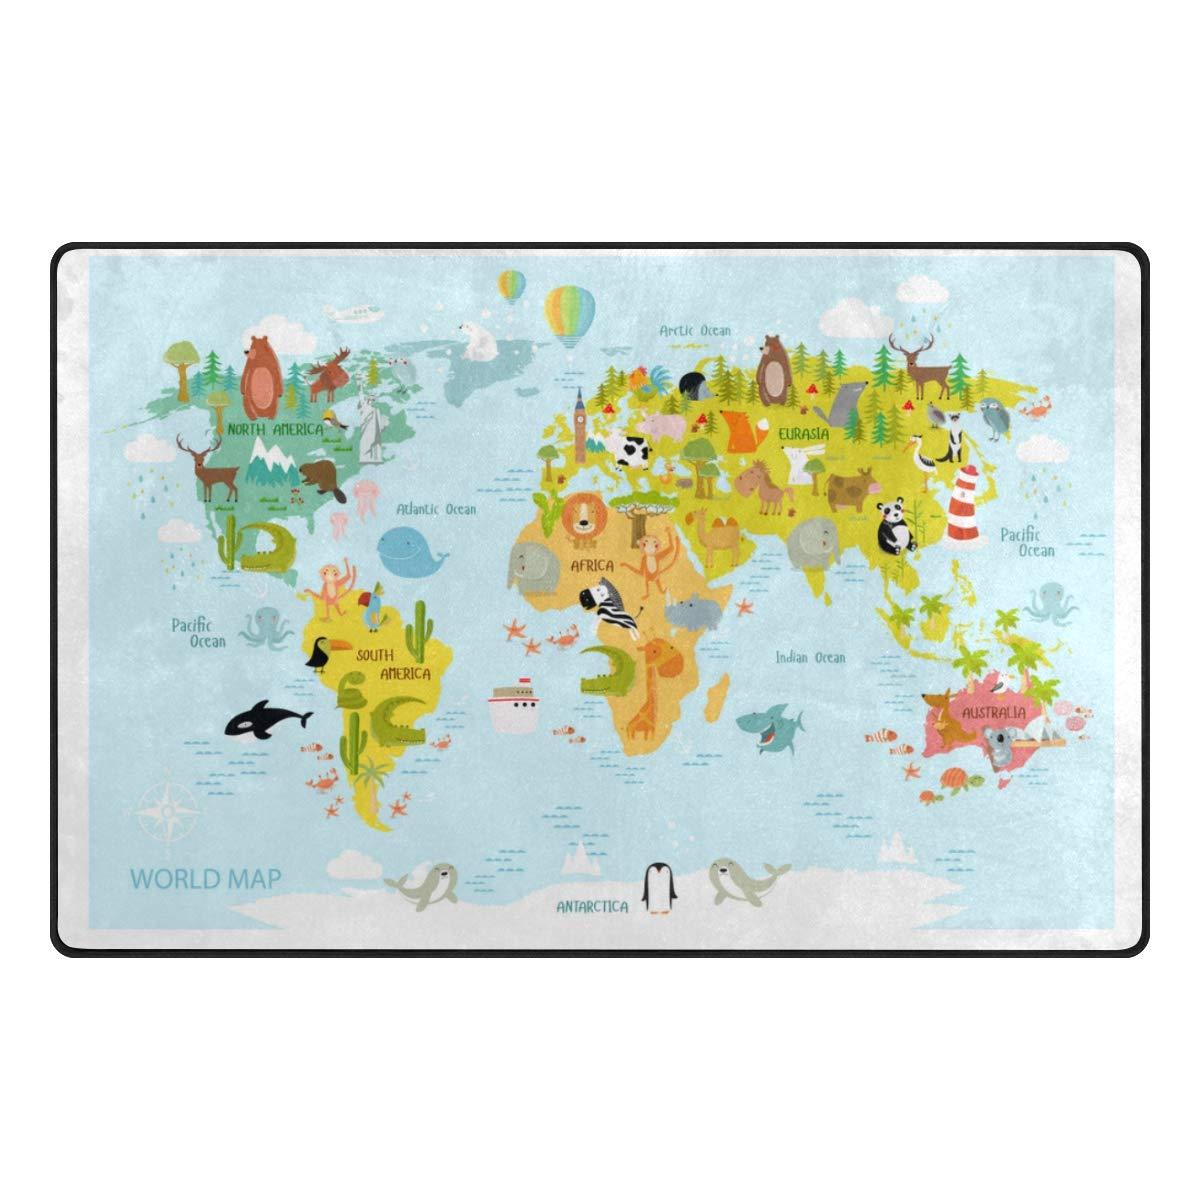 Vantaso Soft Foam Nursery Area Rugs World Map Animals 31x20 inch Play Mats for Kids Playing Room Living Room Door Mat